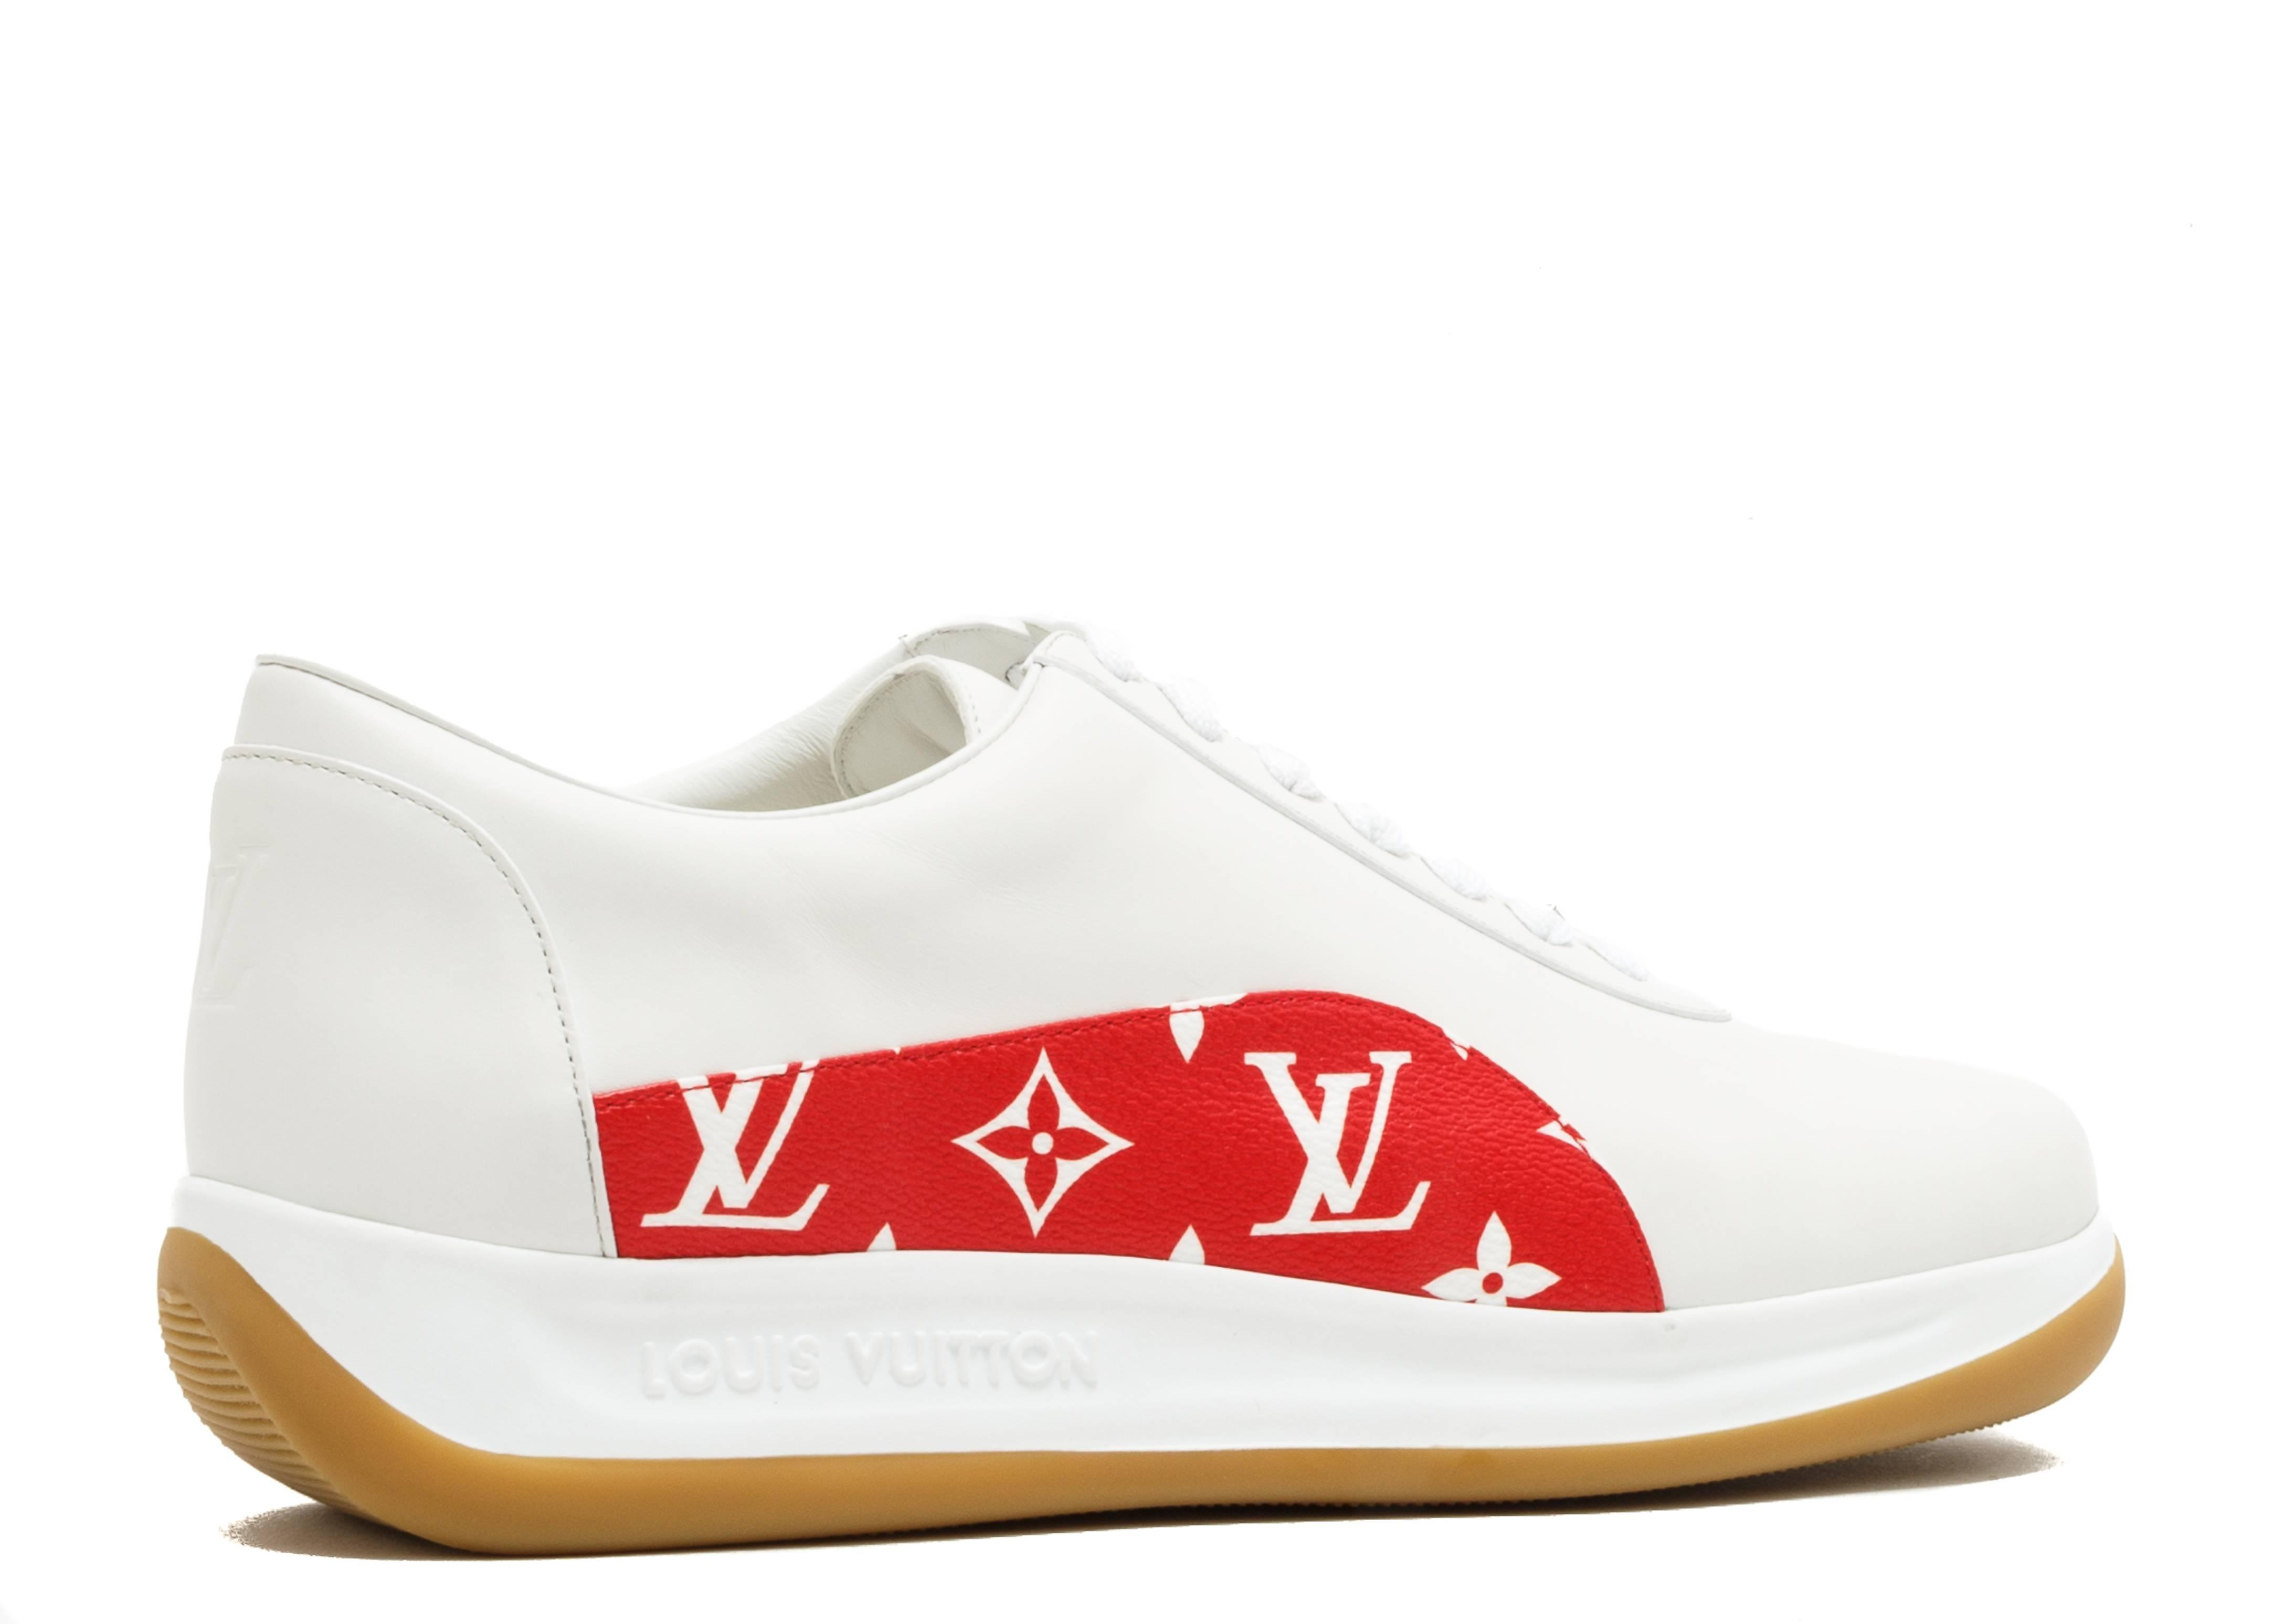 Supreme X Louis Vuitton Louis Vuitton Cl0167 White Red